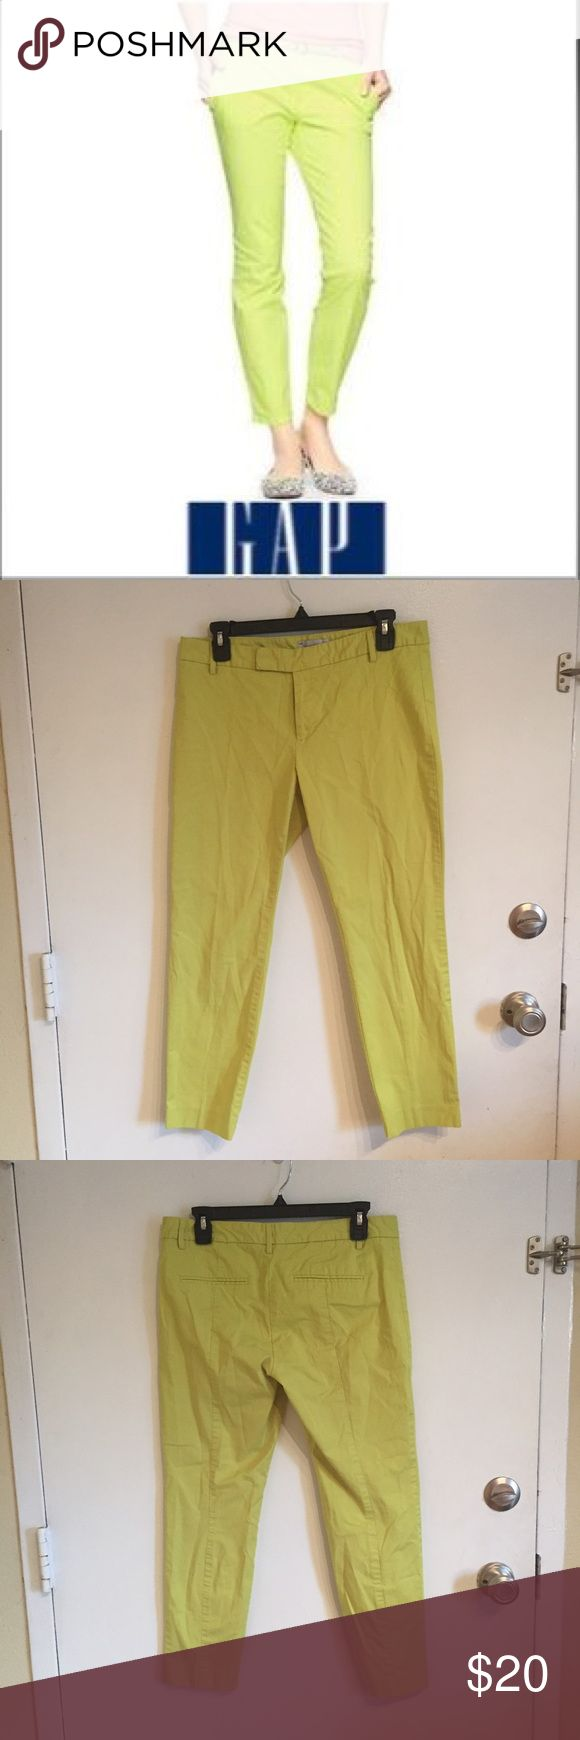 "Gap Slim Cropped Neon Pants Gap slim cropped neon yellow/green pants. 25"" inseam. Size 8 stretch.  #gap #slim #cropped #neon #capri #pants #colorful #bright #spring #stretch #punkydoodle  No modeling Smoke free home I do discount bundles GAP Pants Ankle & Cropped"